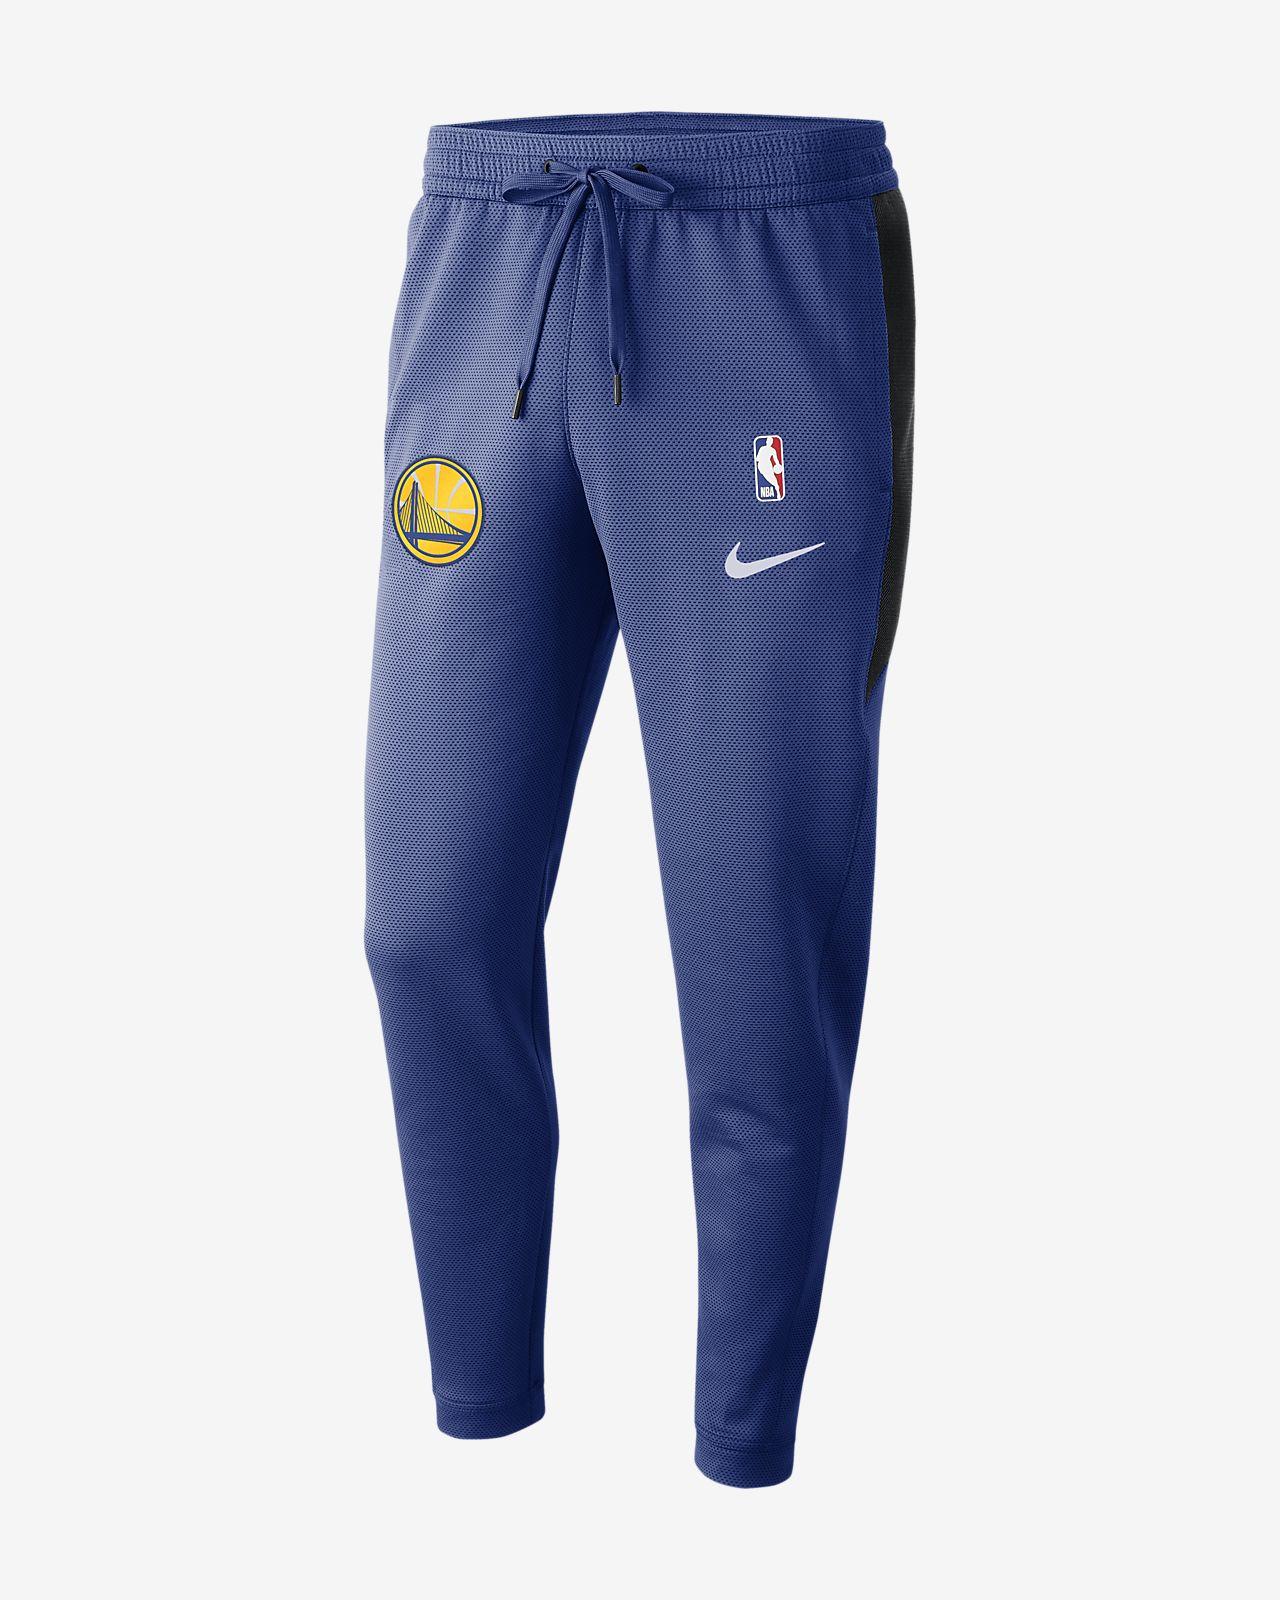 Pantalon NBA Golden State Warriors Nike Therma Flex Showtime pour Homme